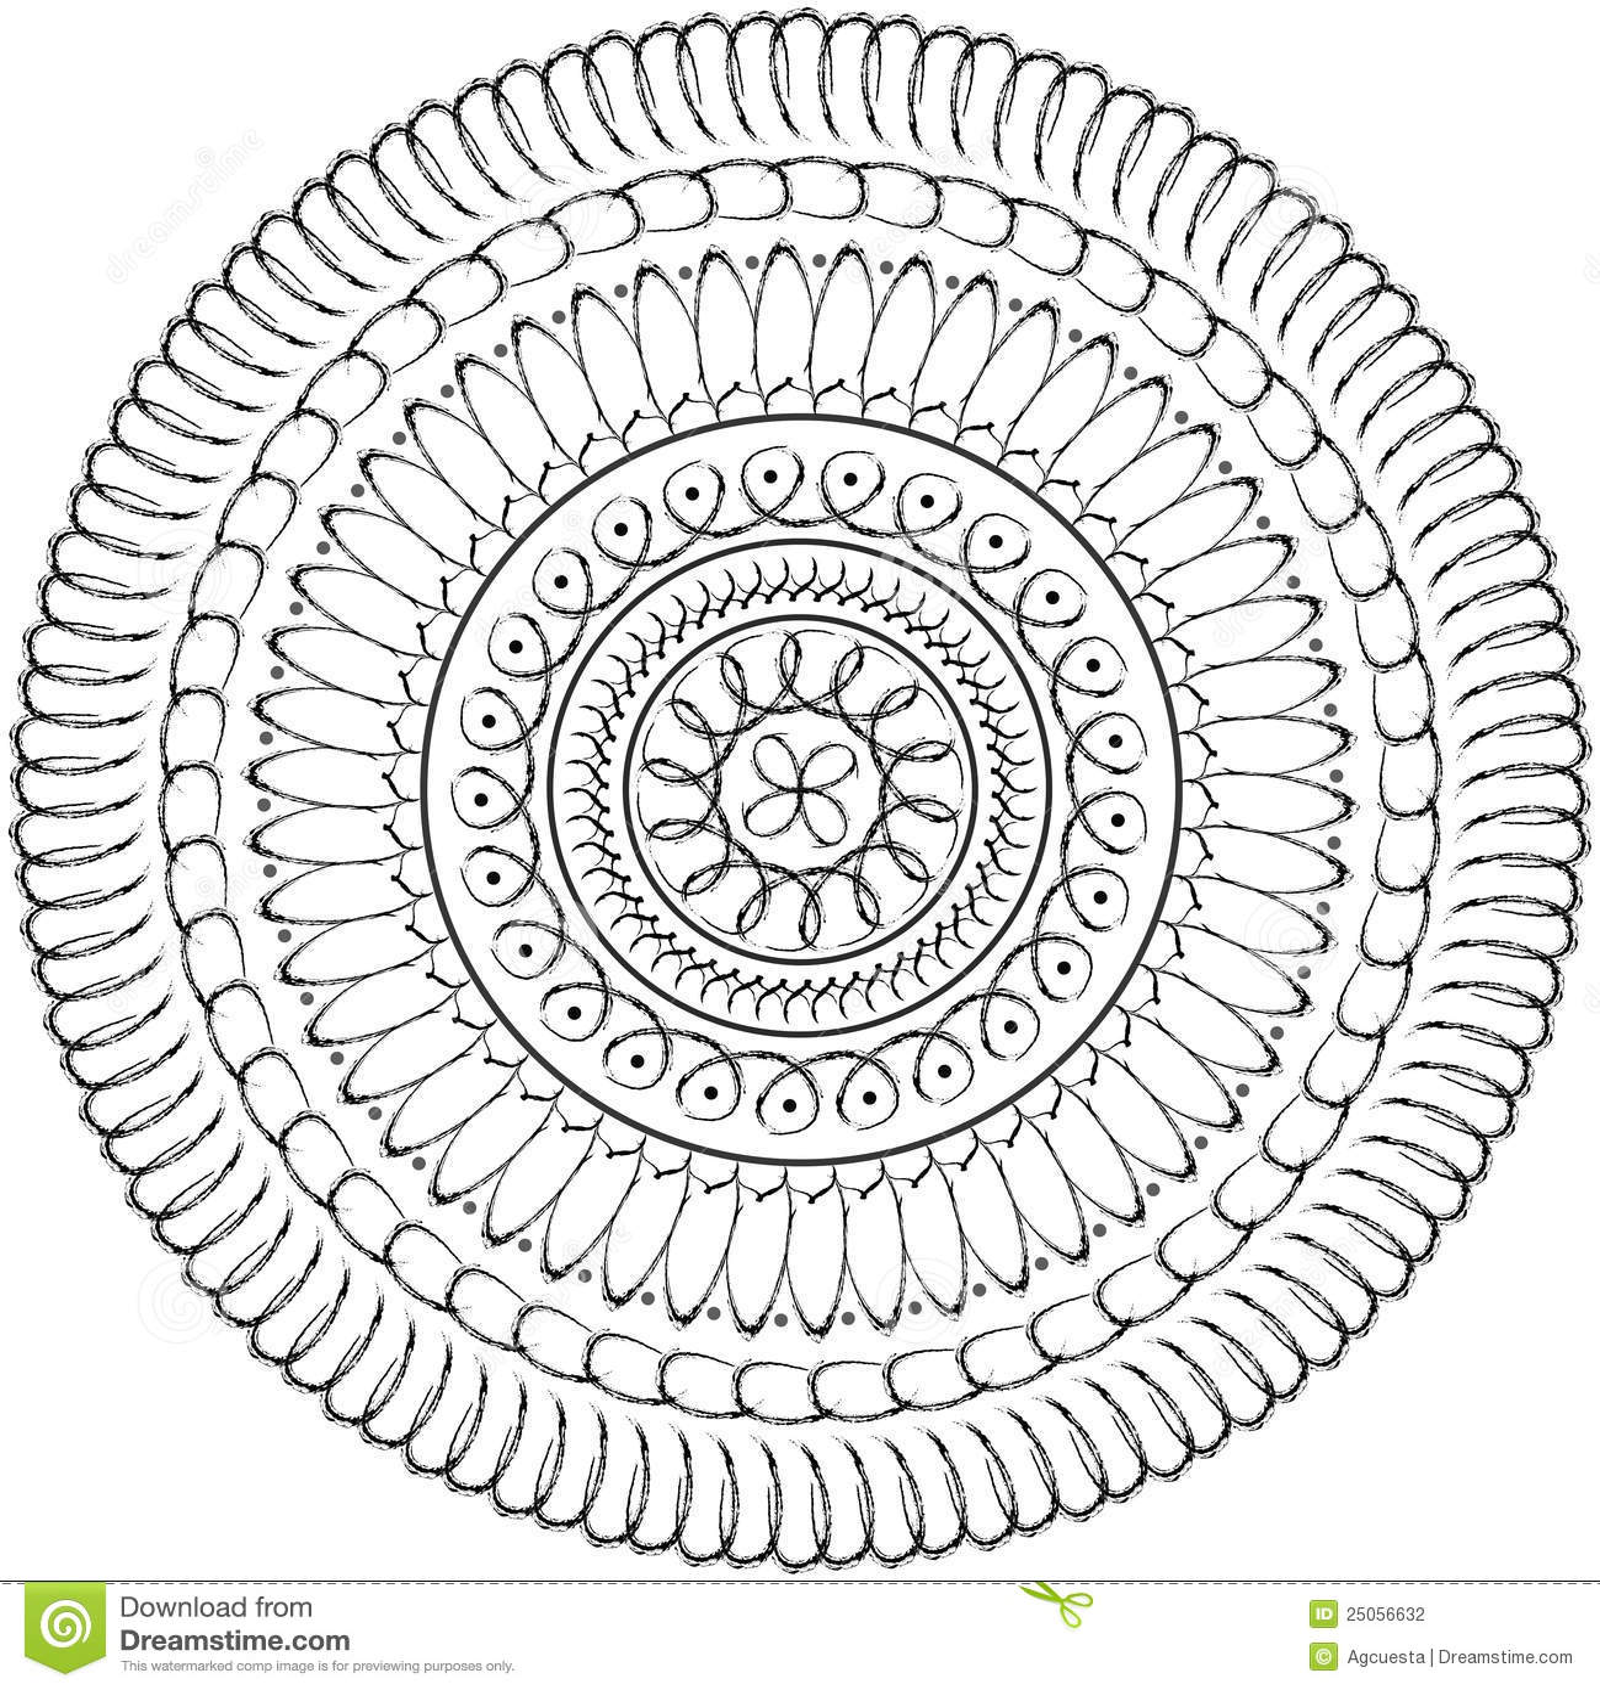 mandala floral gr225fico geom233trico c237rculo sagrado